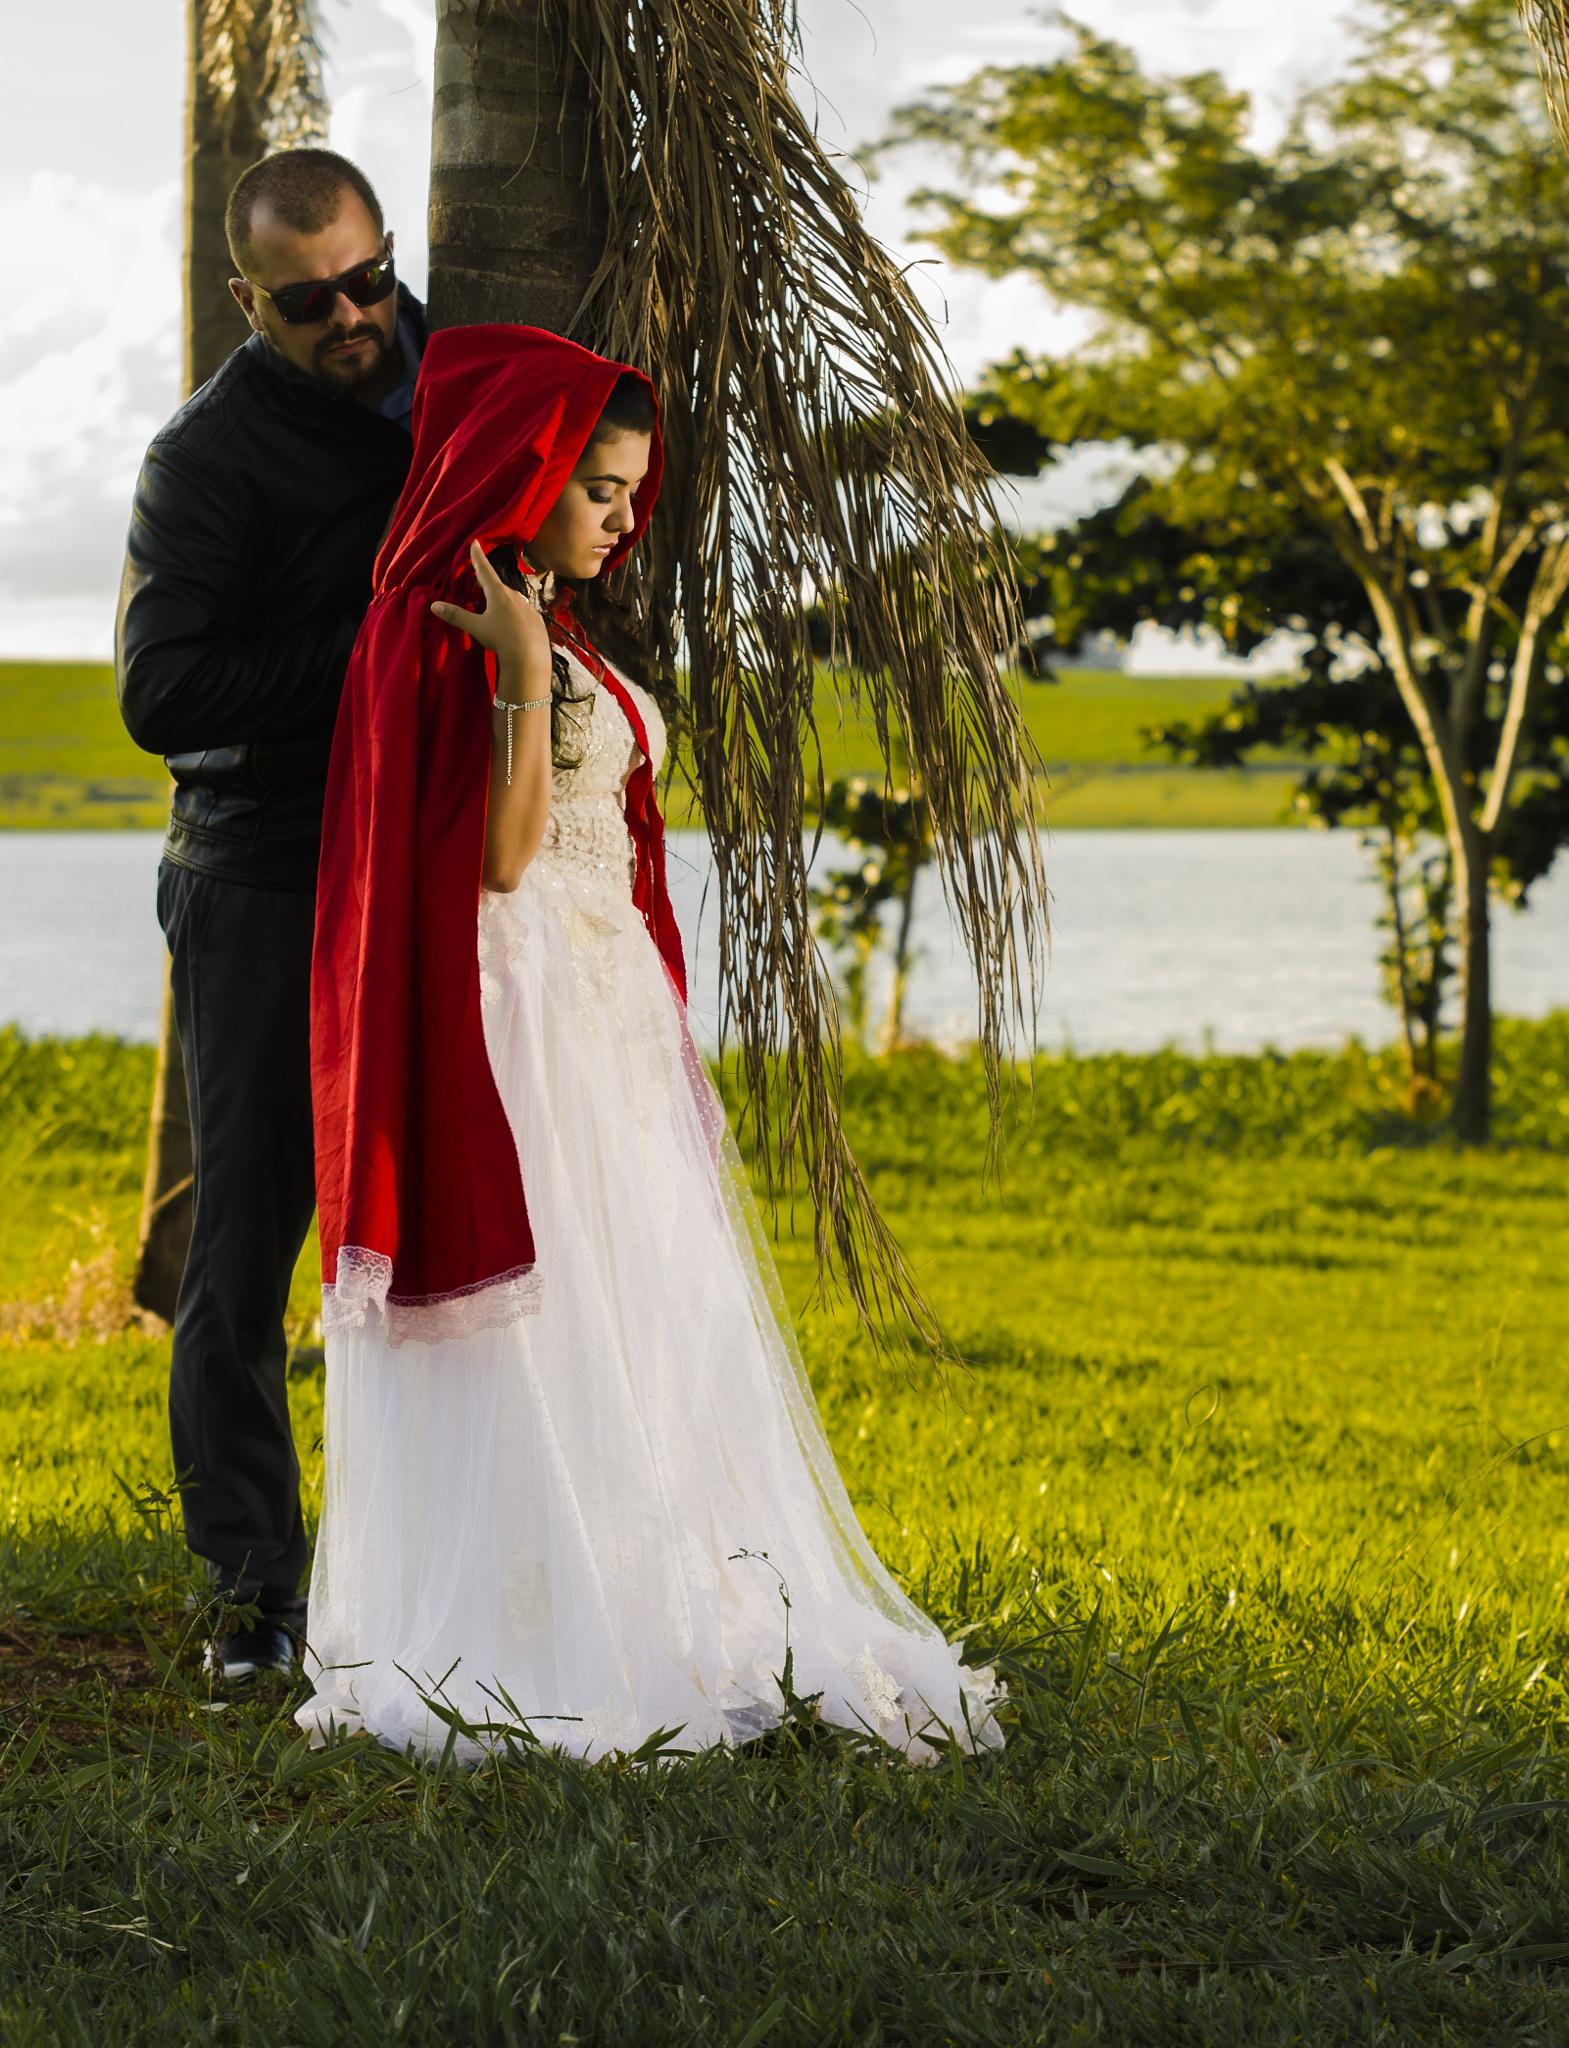 Pre wedding - Little Red Riding Hood by Geisson Rocha